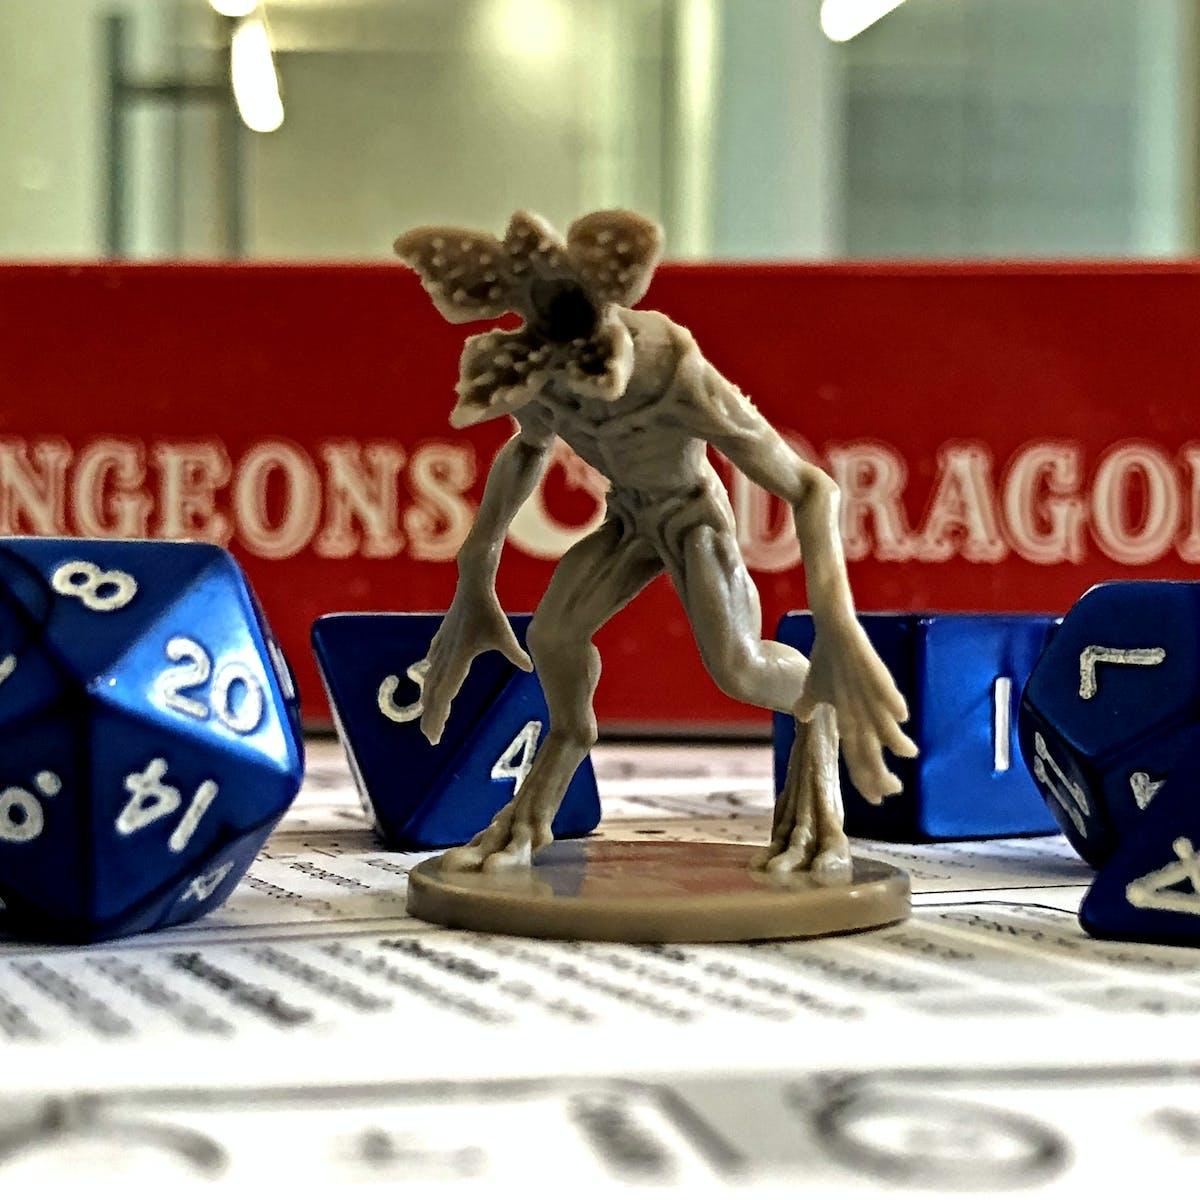 Stranger Things' Dungeons & Dragons Explores Trauma Through